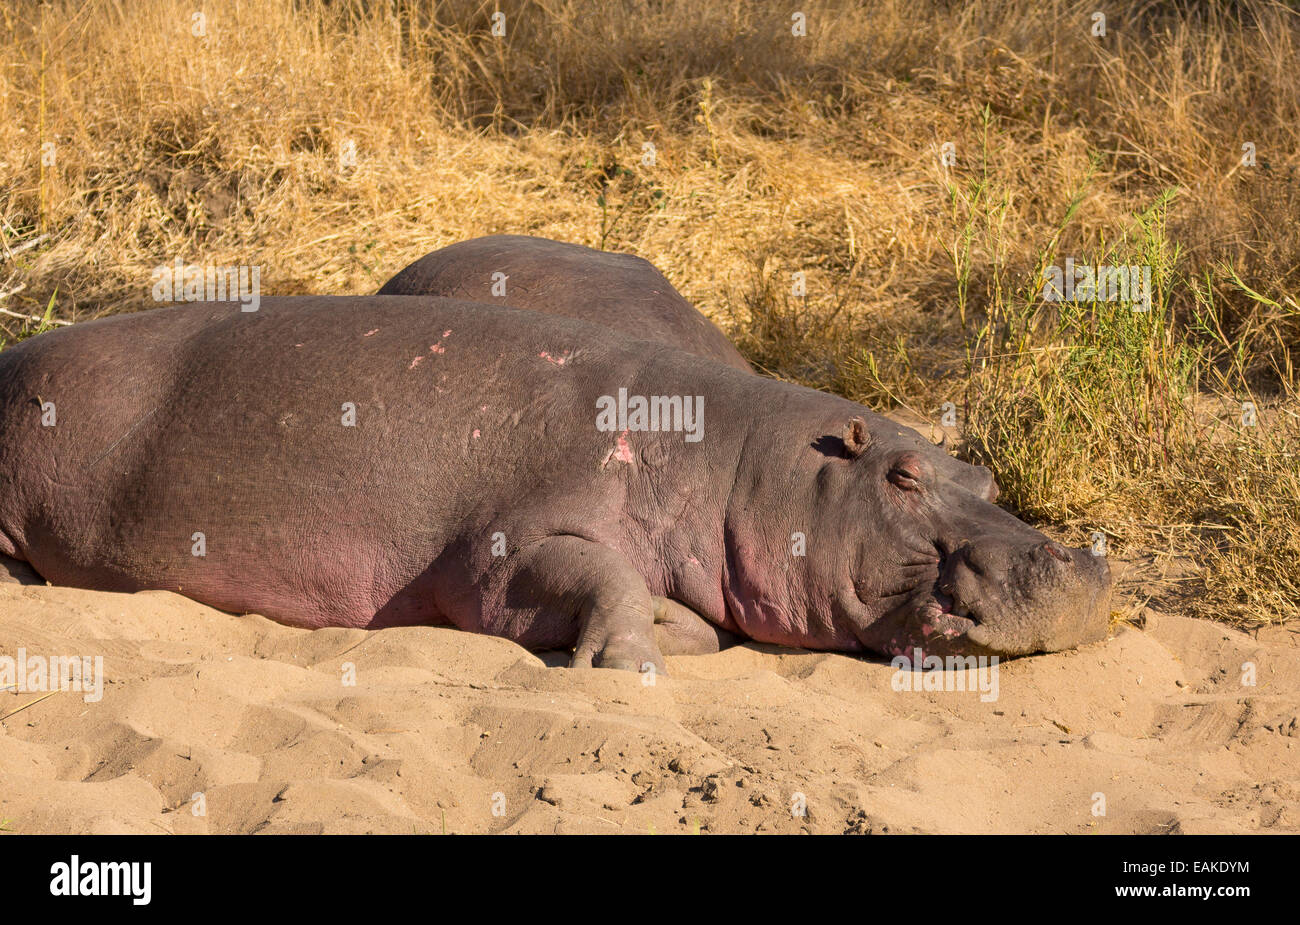 KRUGER NATIONAL PARK, SOUTH AFRICA - Hippopotamus basking on river bank. - Stock Image